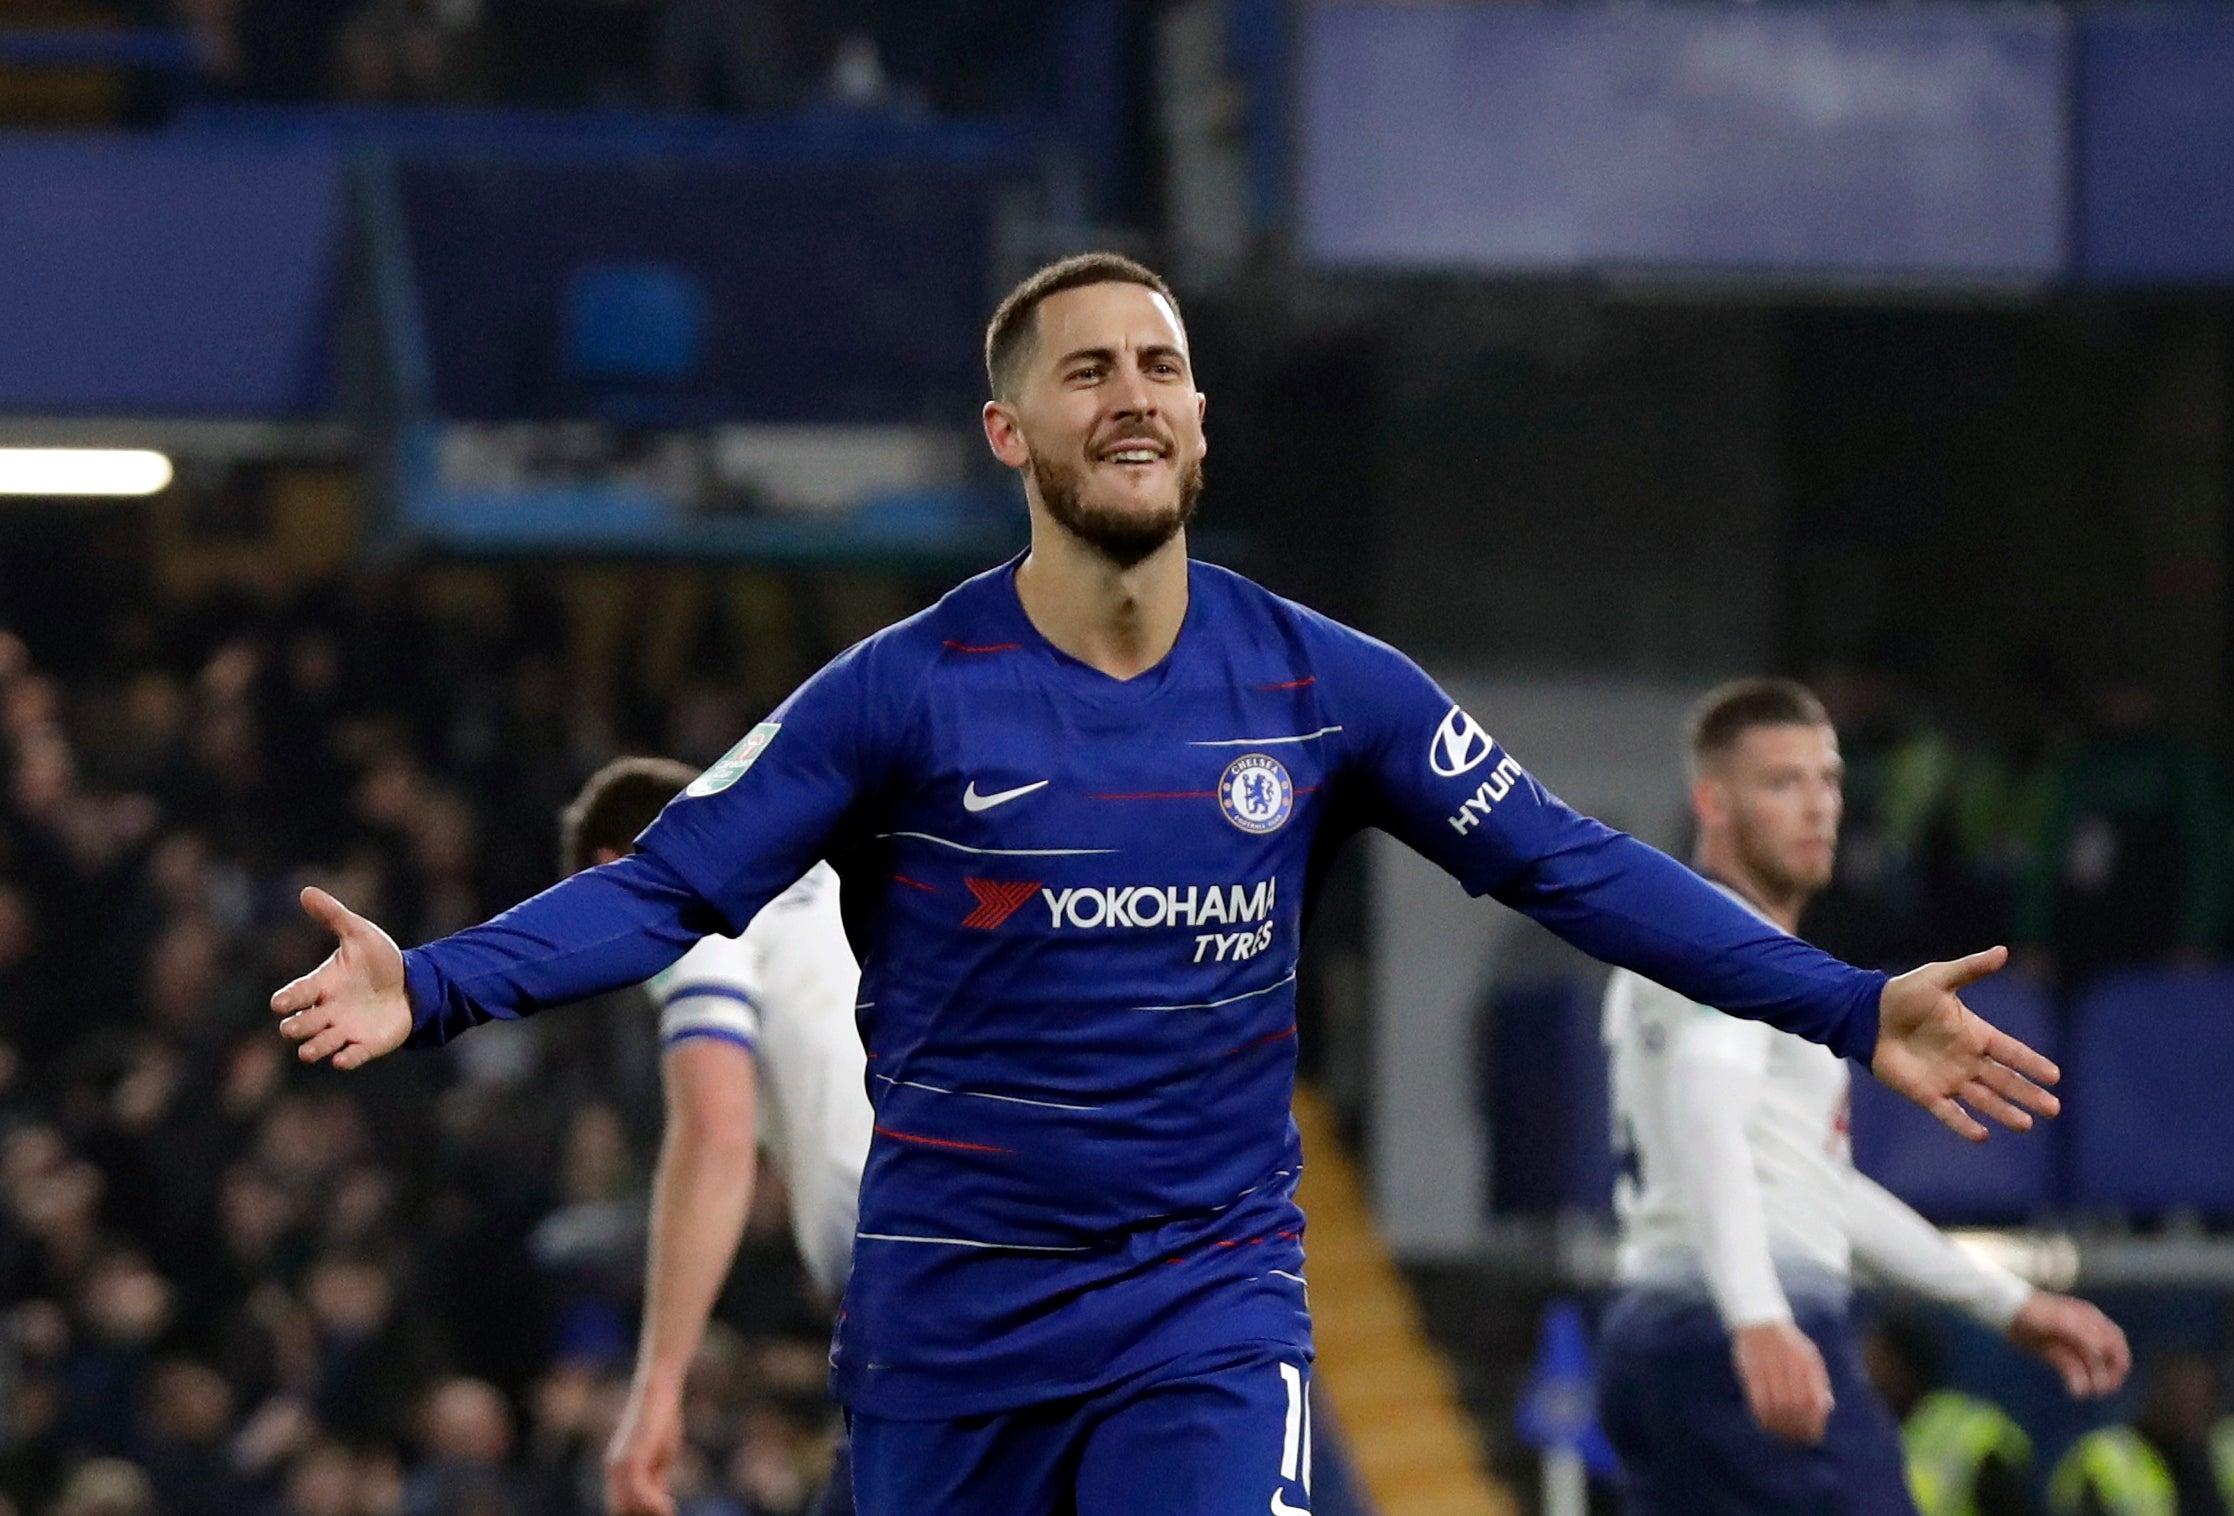 Chelsea transfer news: Eden Hazard is free leave Stamford Bridge if he wants, says Maurizio Sarri